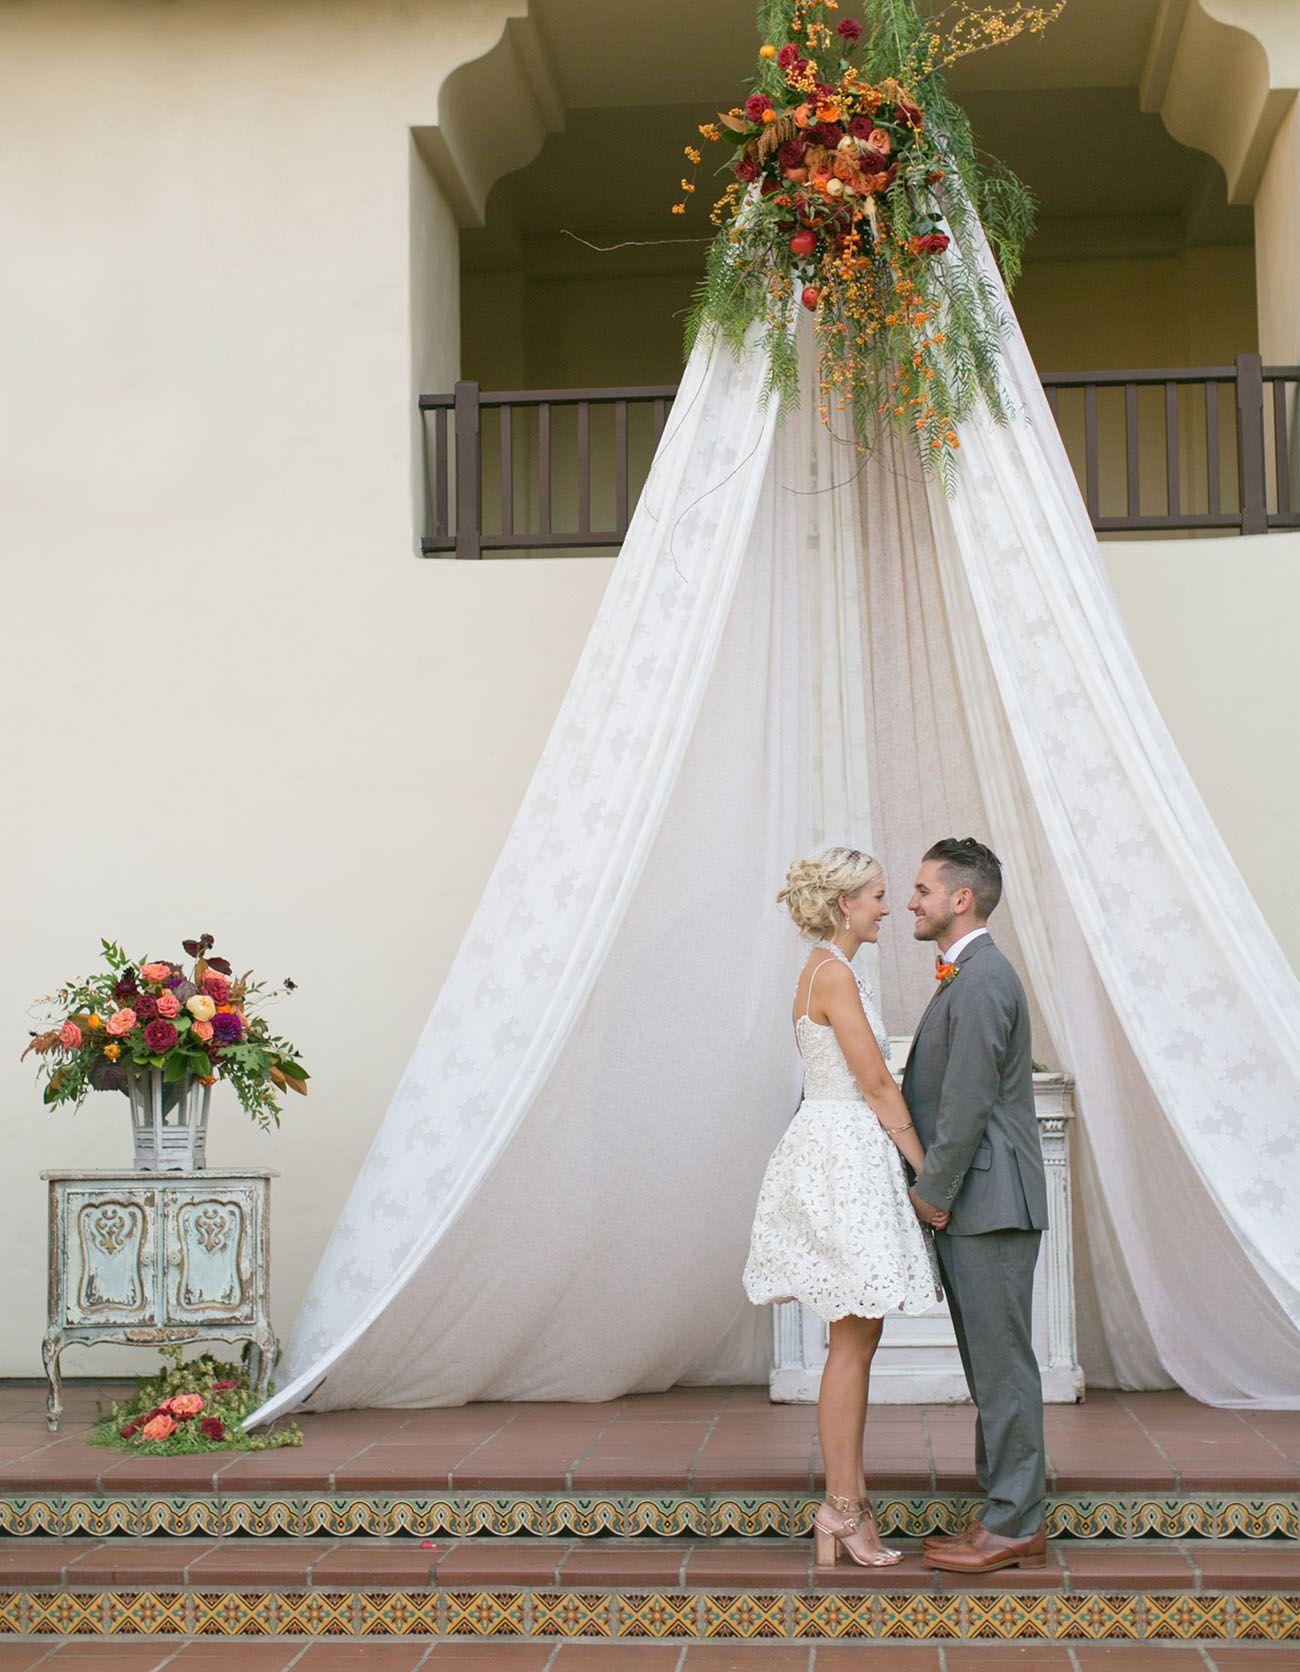 Wedding decorations backdrop  Boho Chic La Jolla California Wedding Kenzie  Collin  Chic